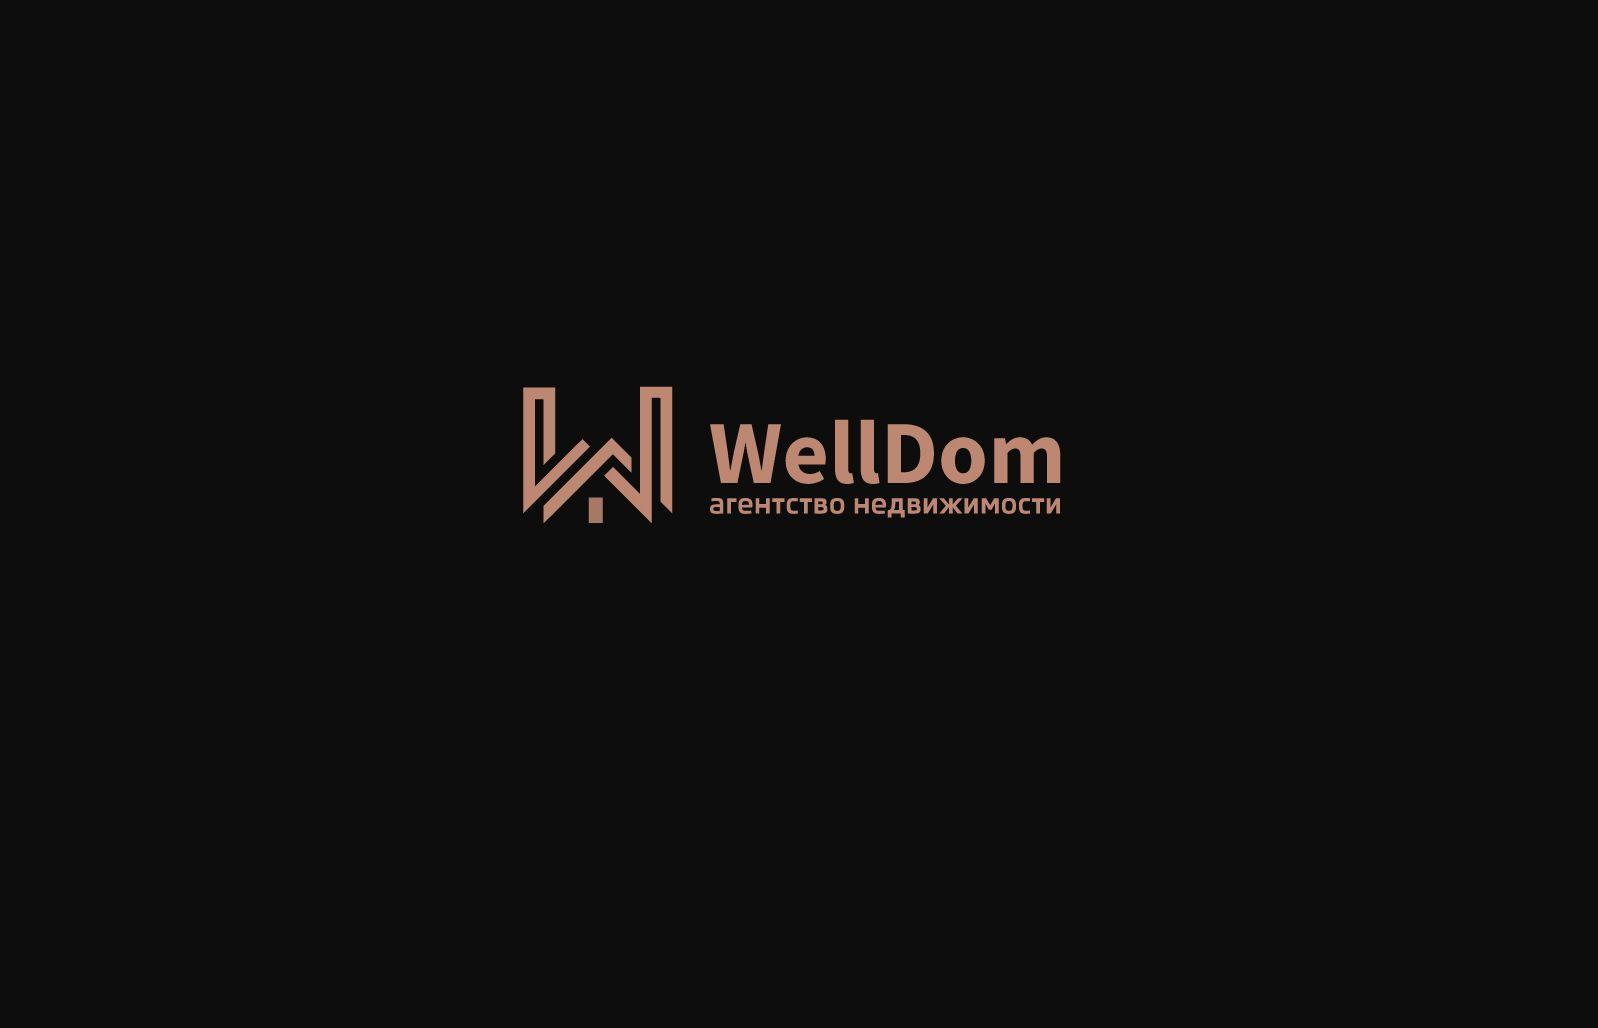 Логотип для WellDom  - дизайнер andblin61